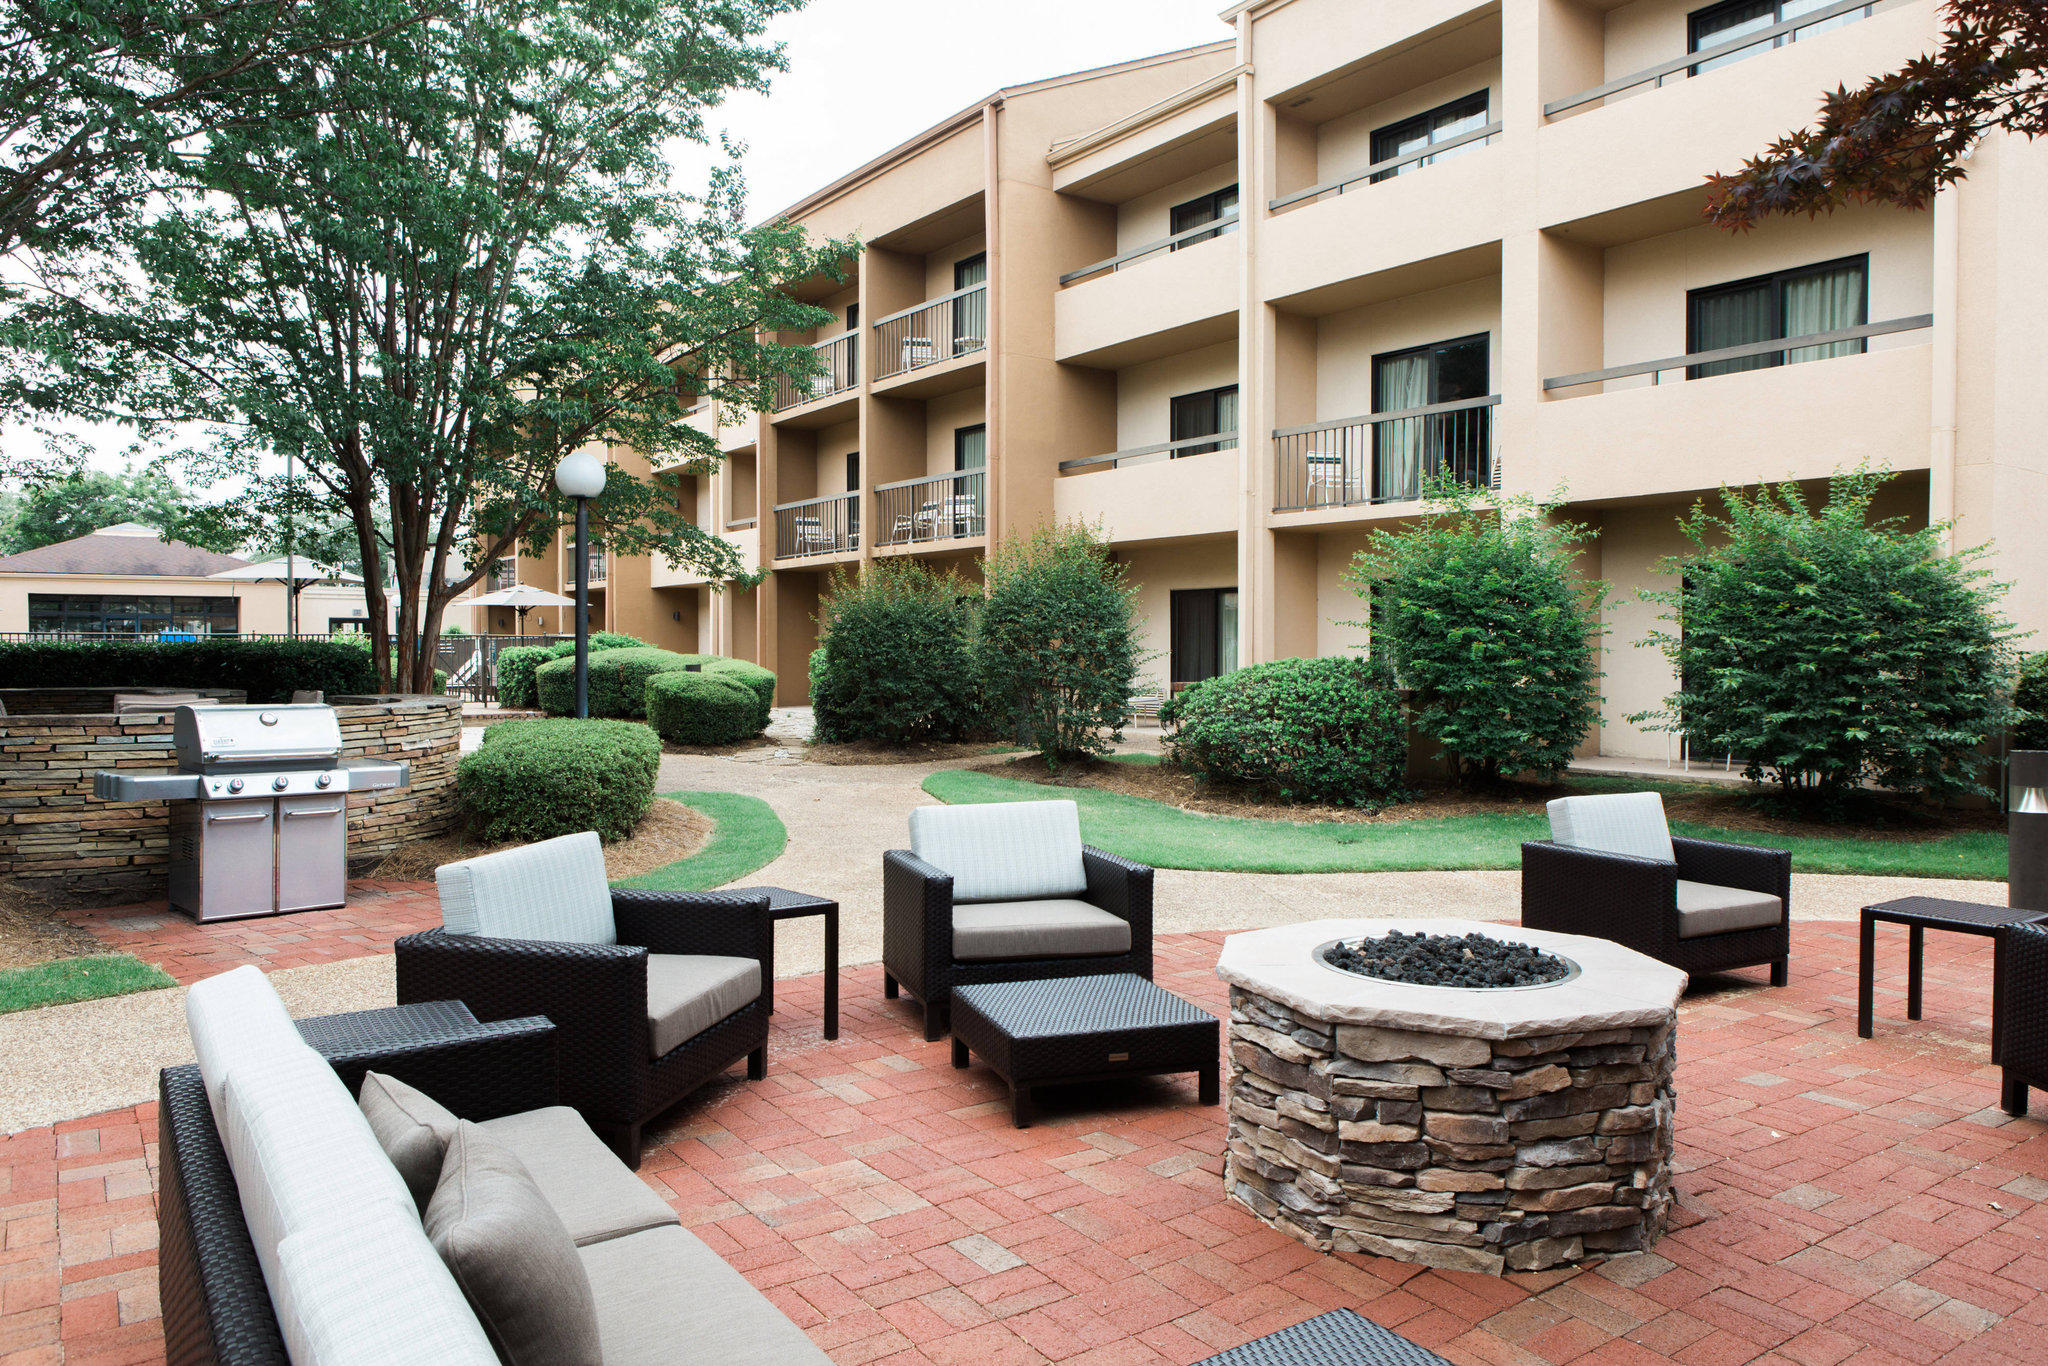 Courtyard by Marriott Montgomery